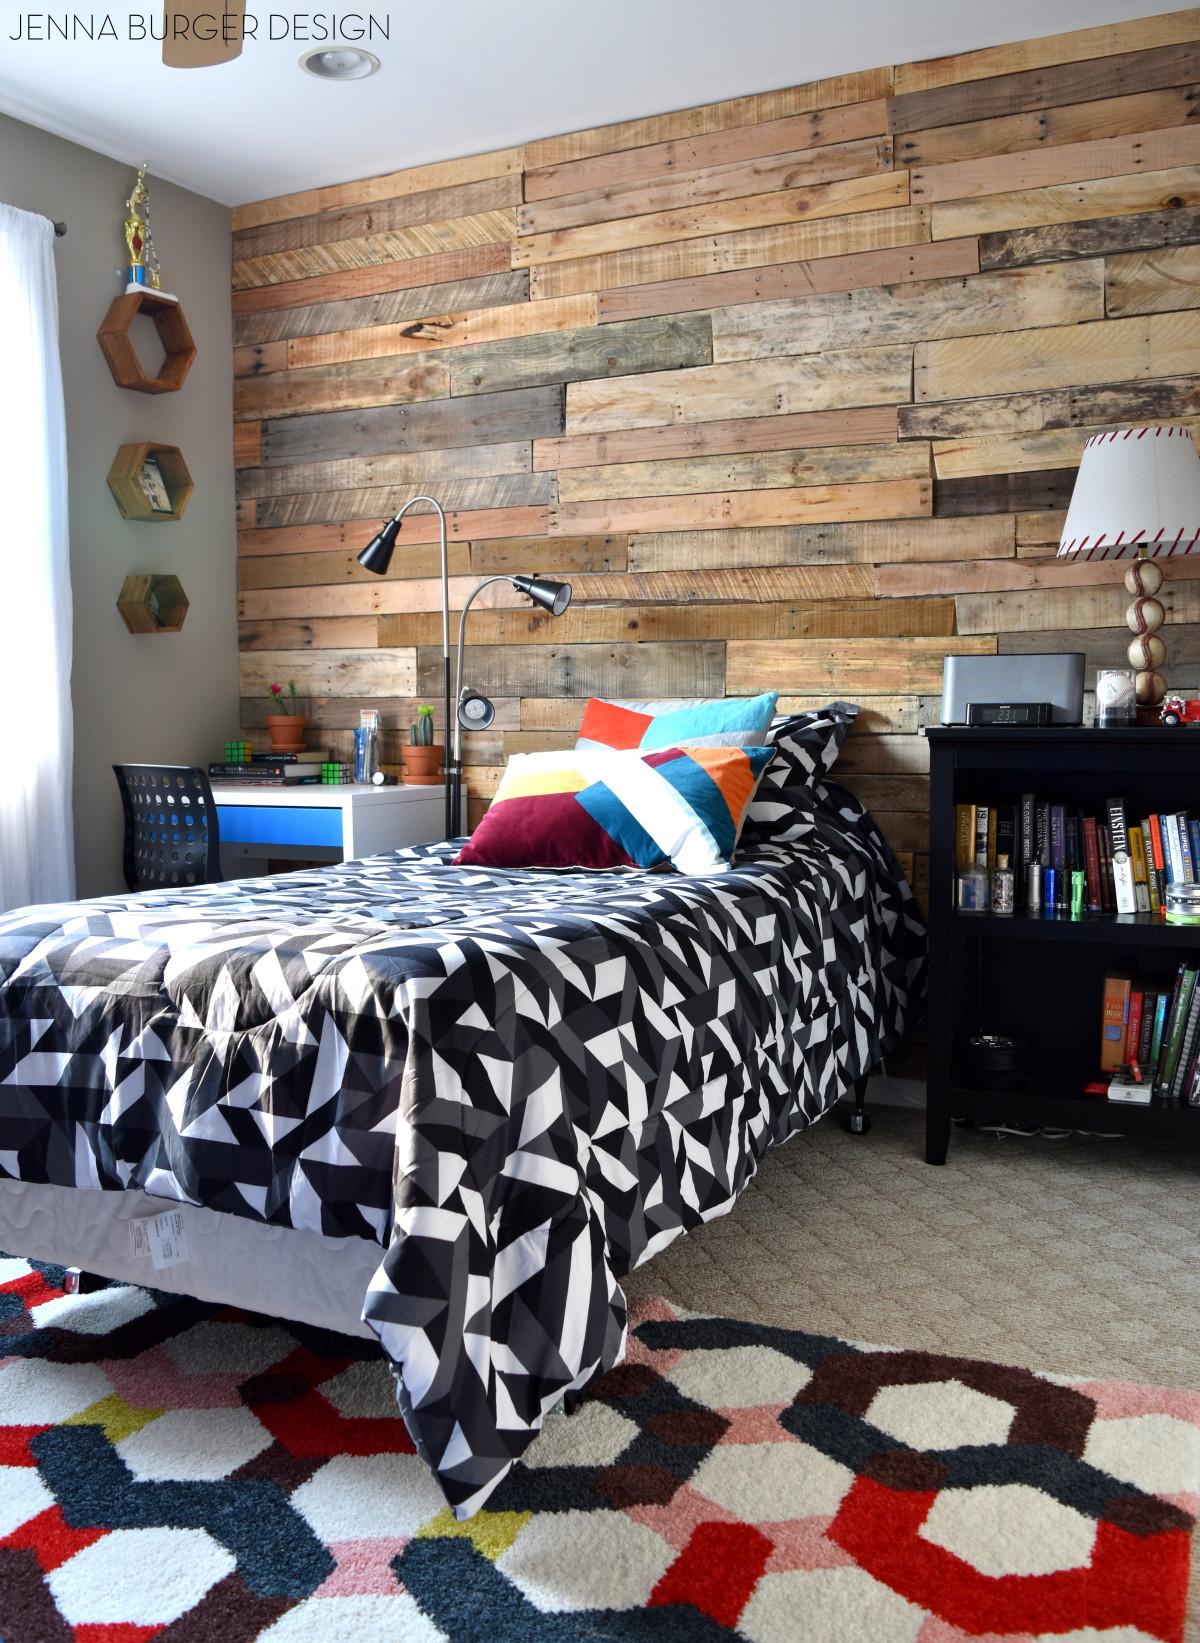 Modern, Rustic Teen Room + DIY Pallet Wall Tutorial ... on Pallet Room Ideas  id=98745